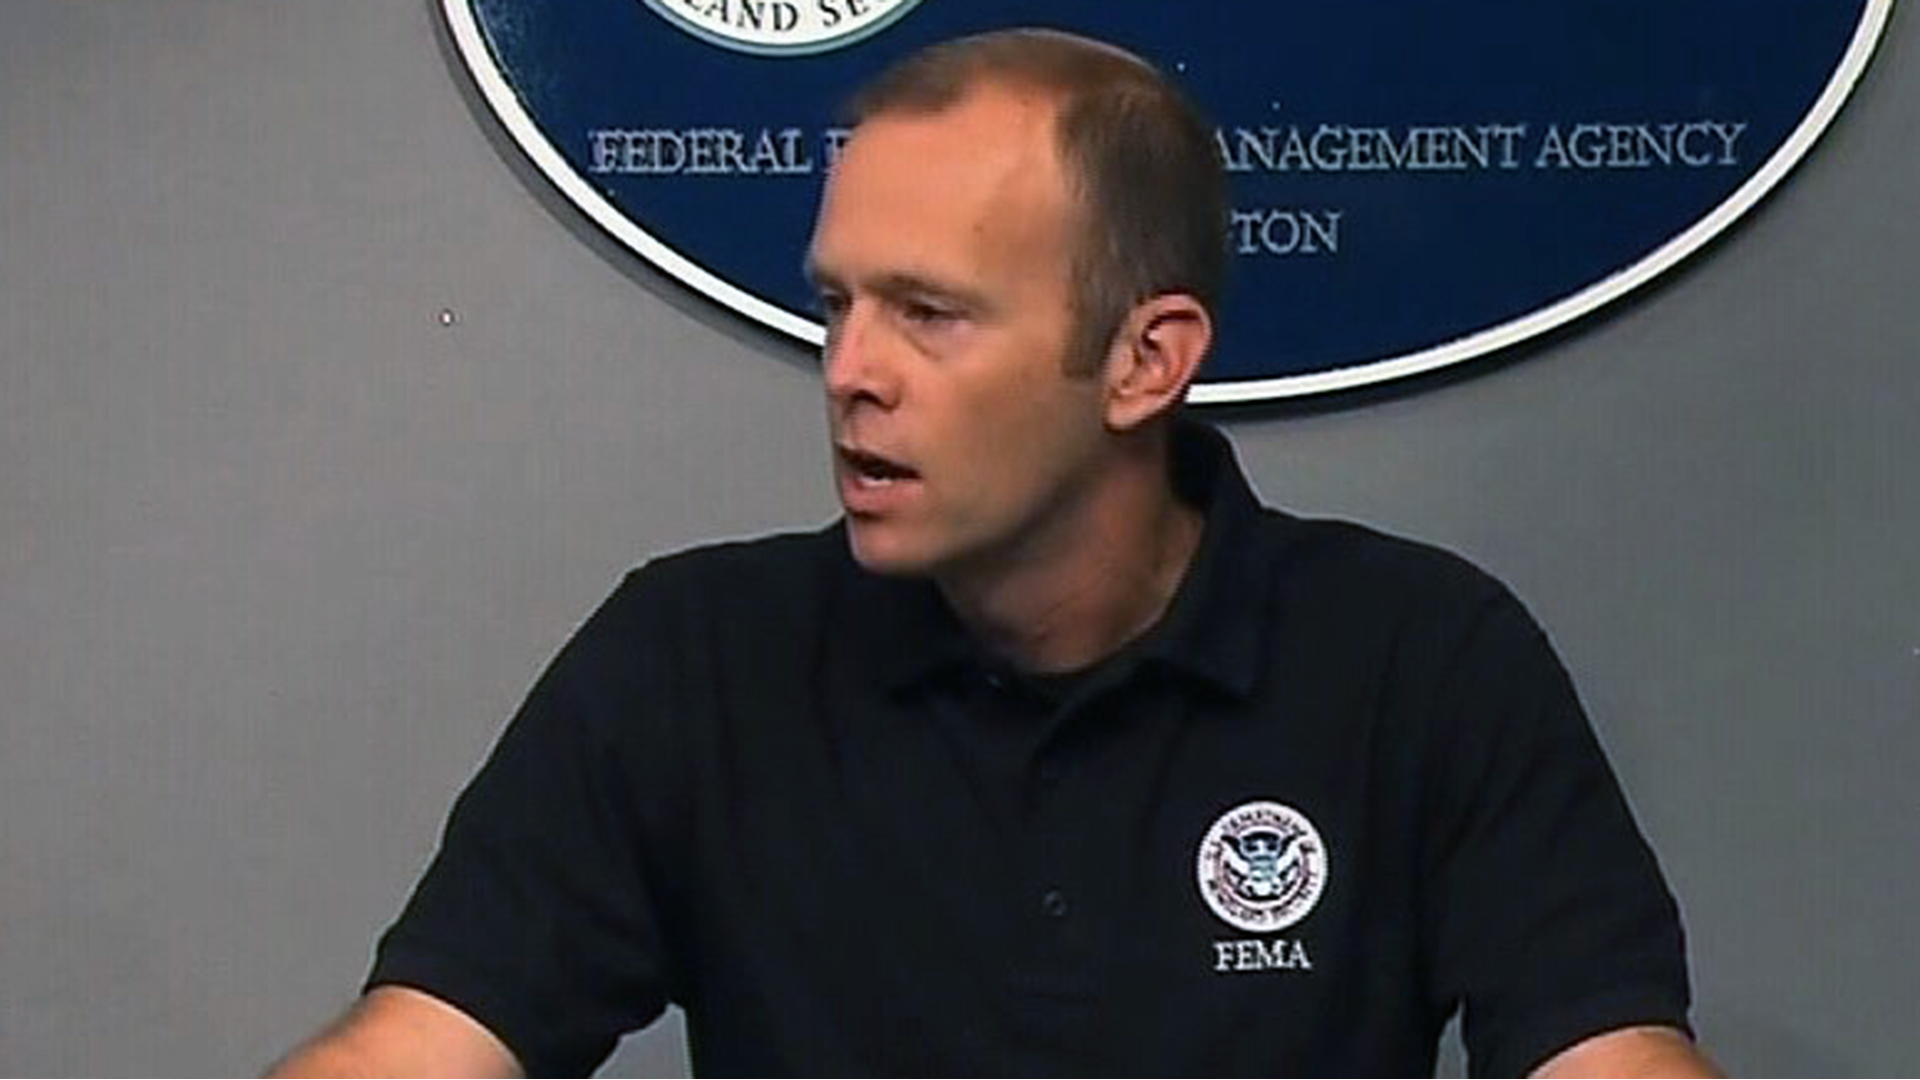 FEMA Administrator Brock Long-159532.jpg01671129